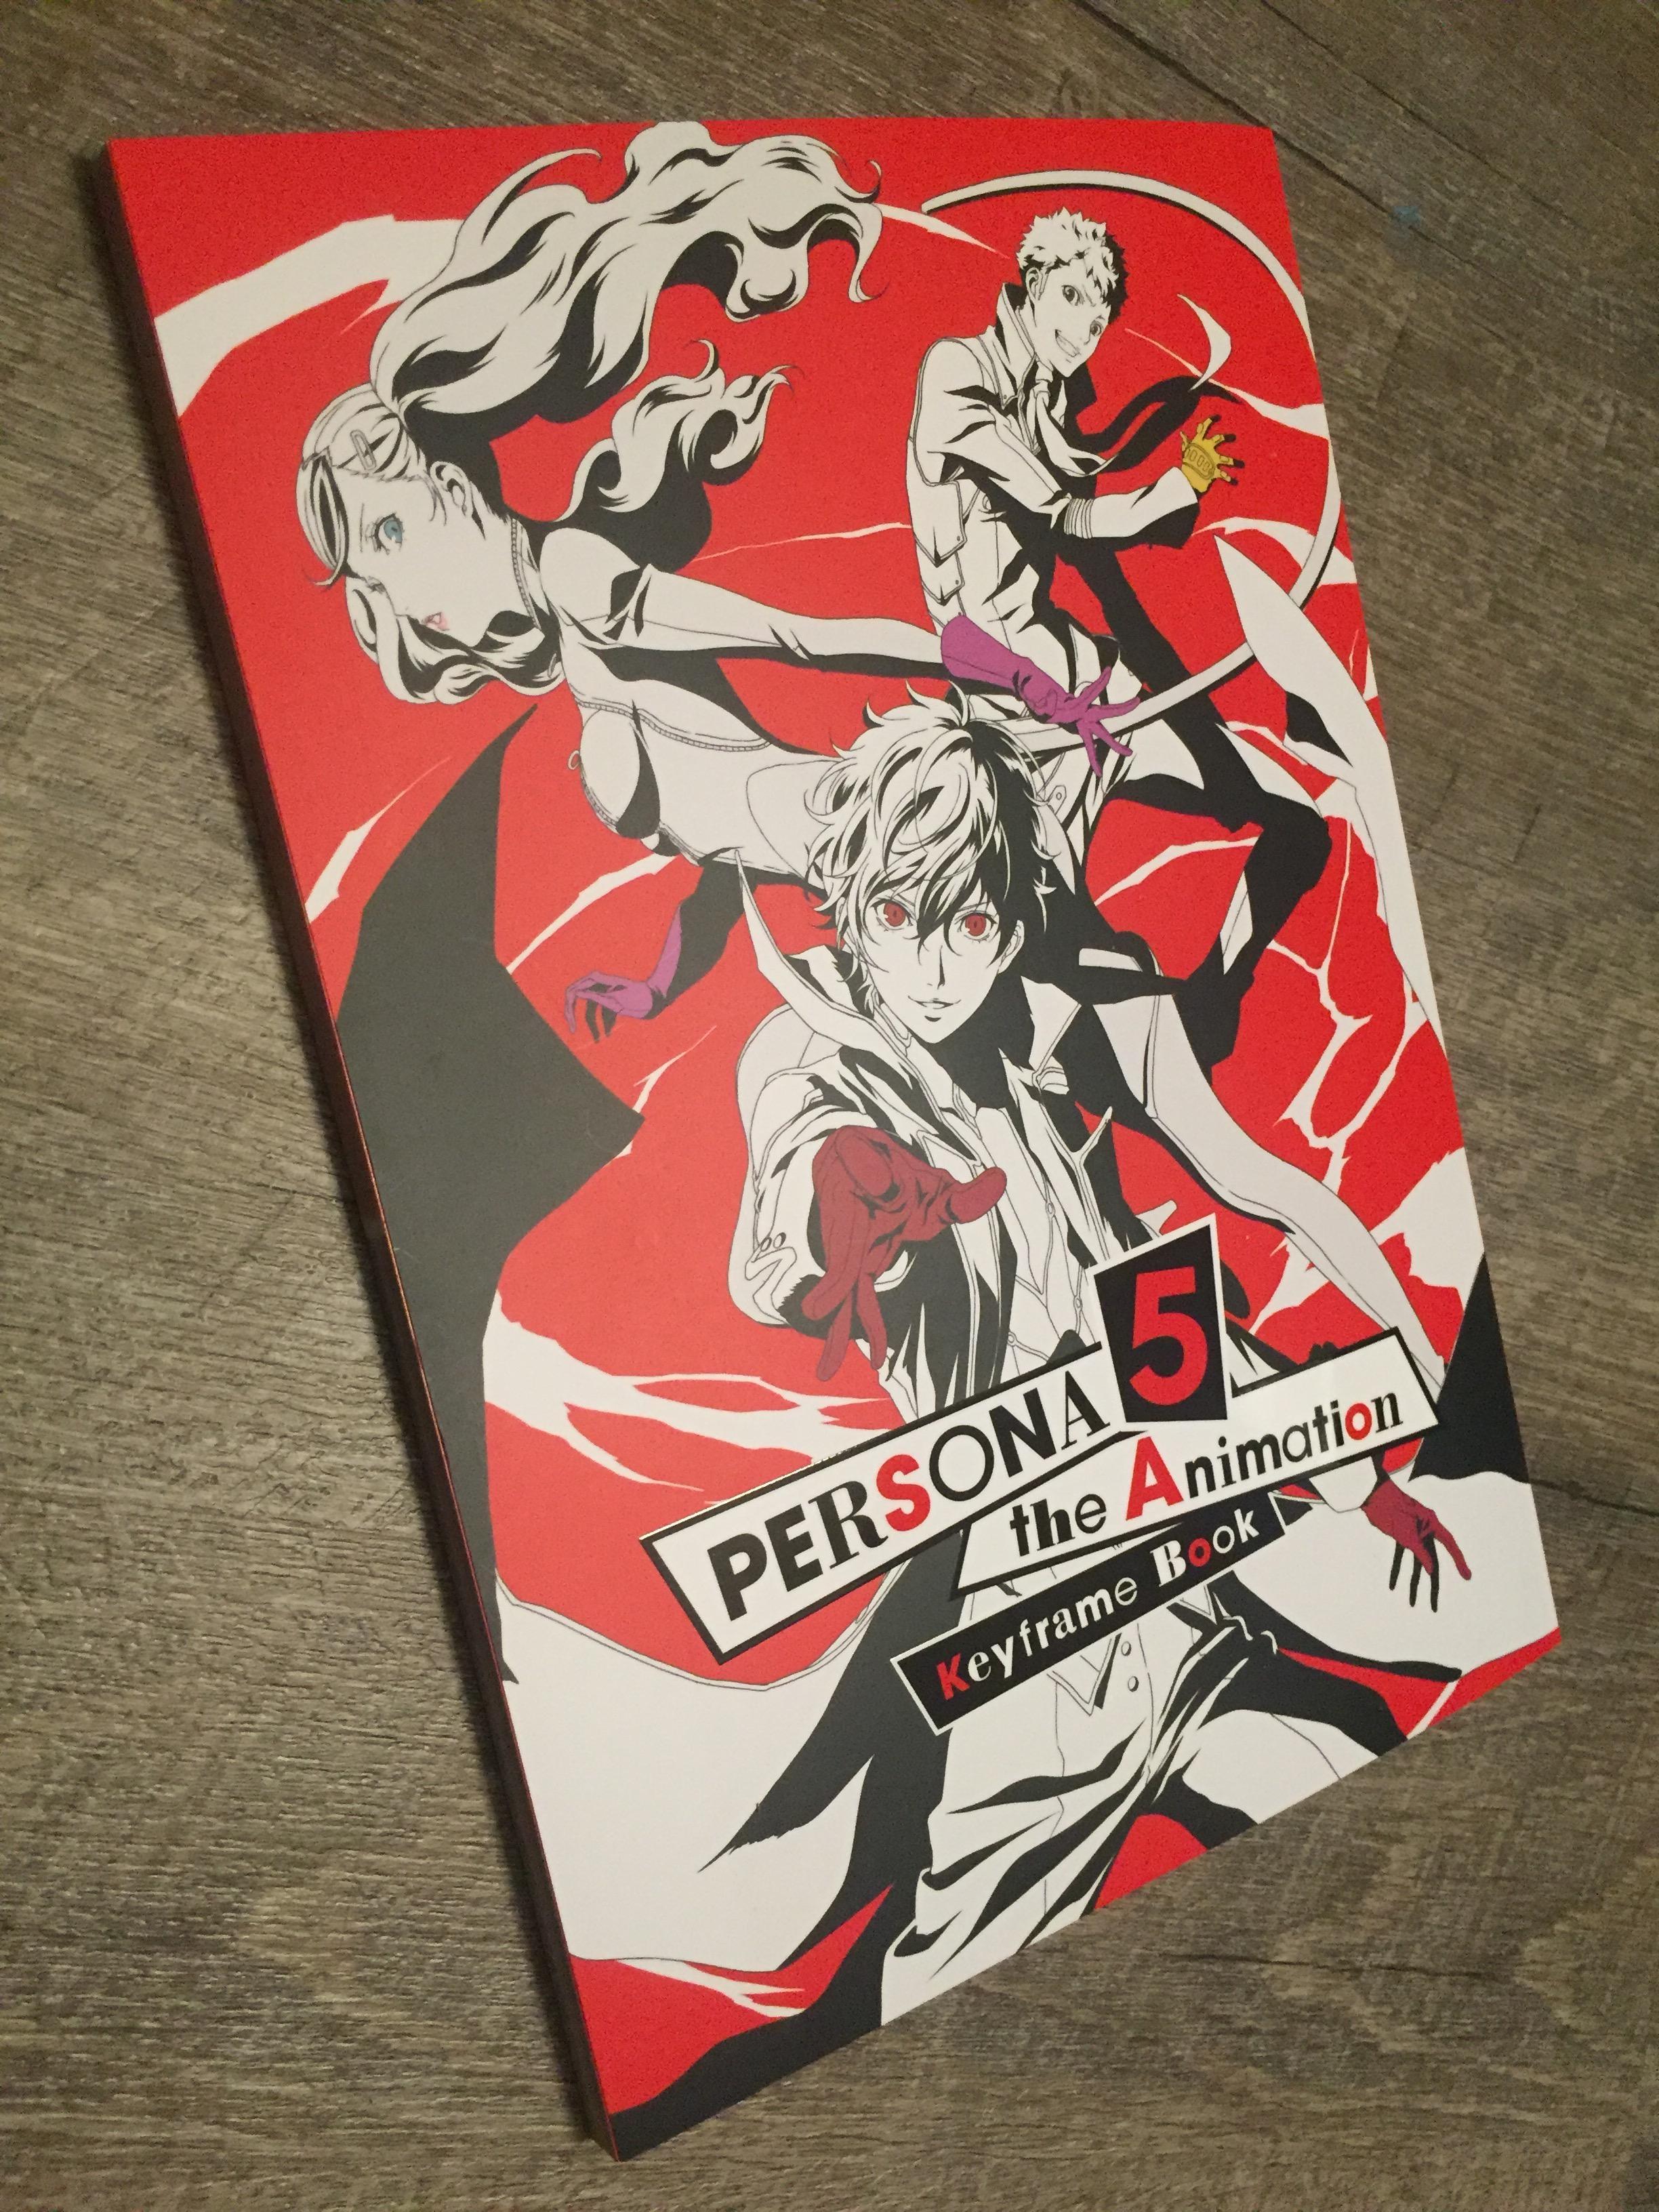 persona 5 the animation keyframe book.JPG